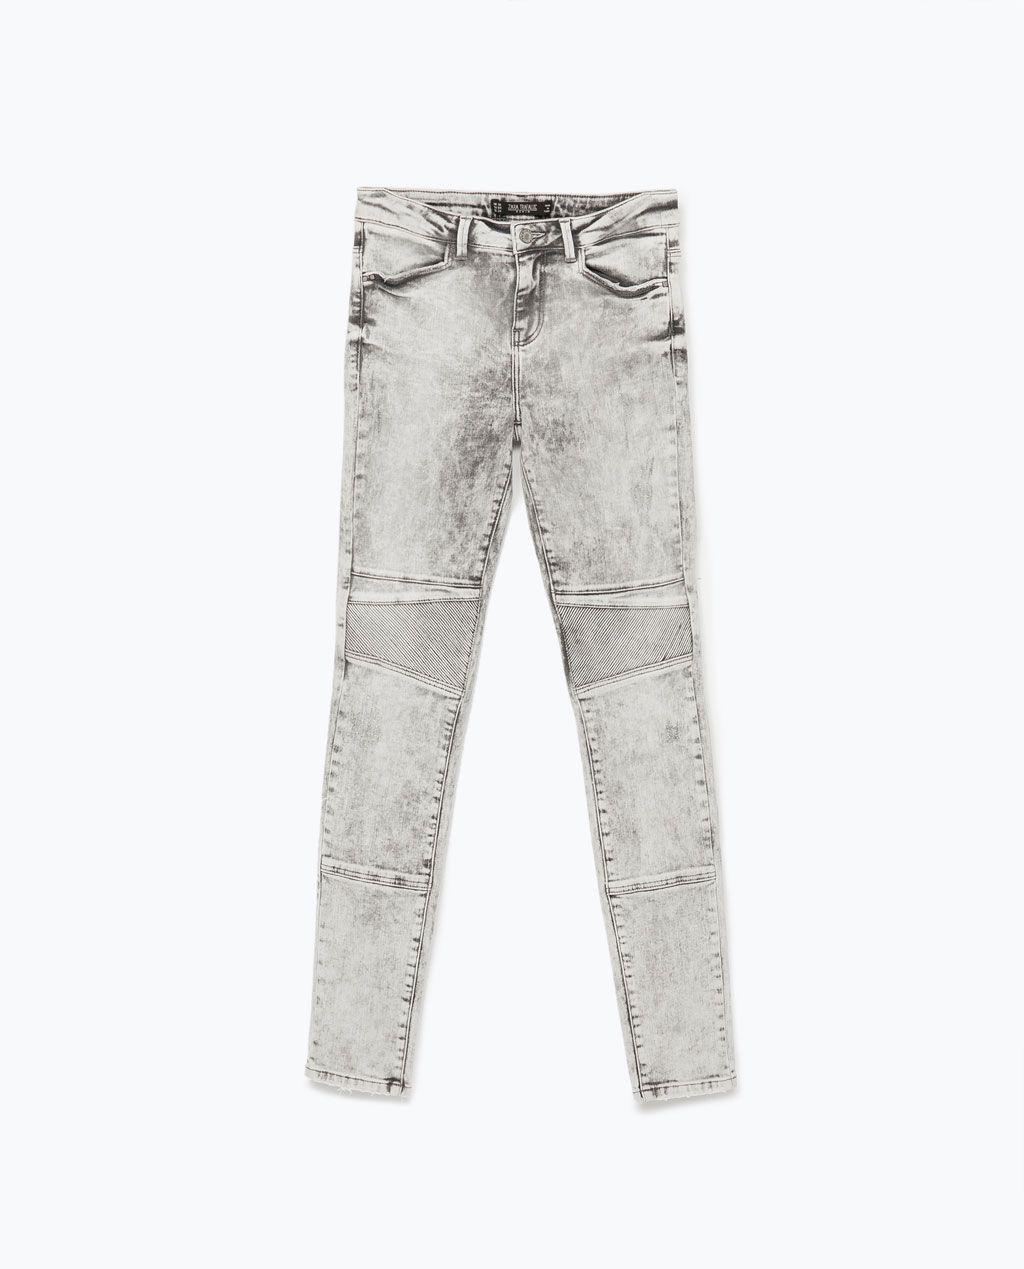 408c44c82a BIKER TROUSERS - Jeans - WOMAN | ZARA Czech Republic | ¸Z.A.R.A. ...